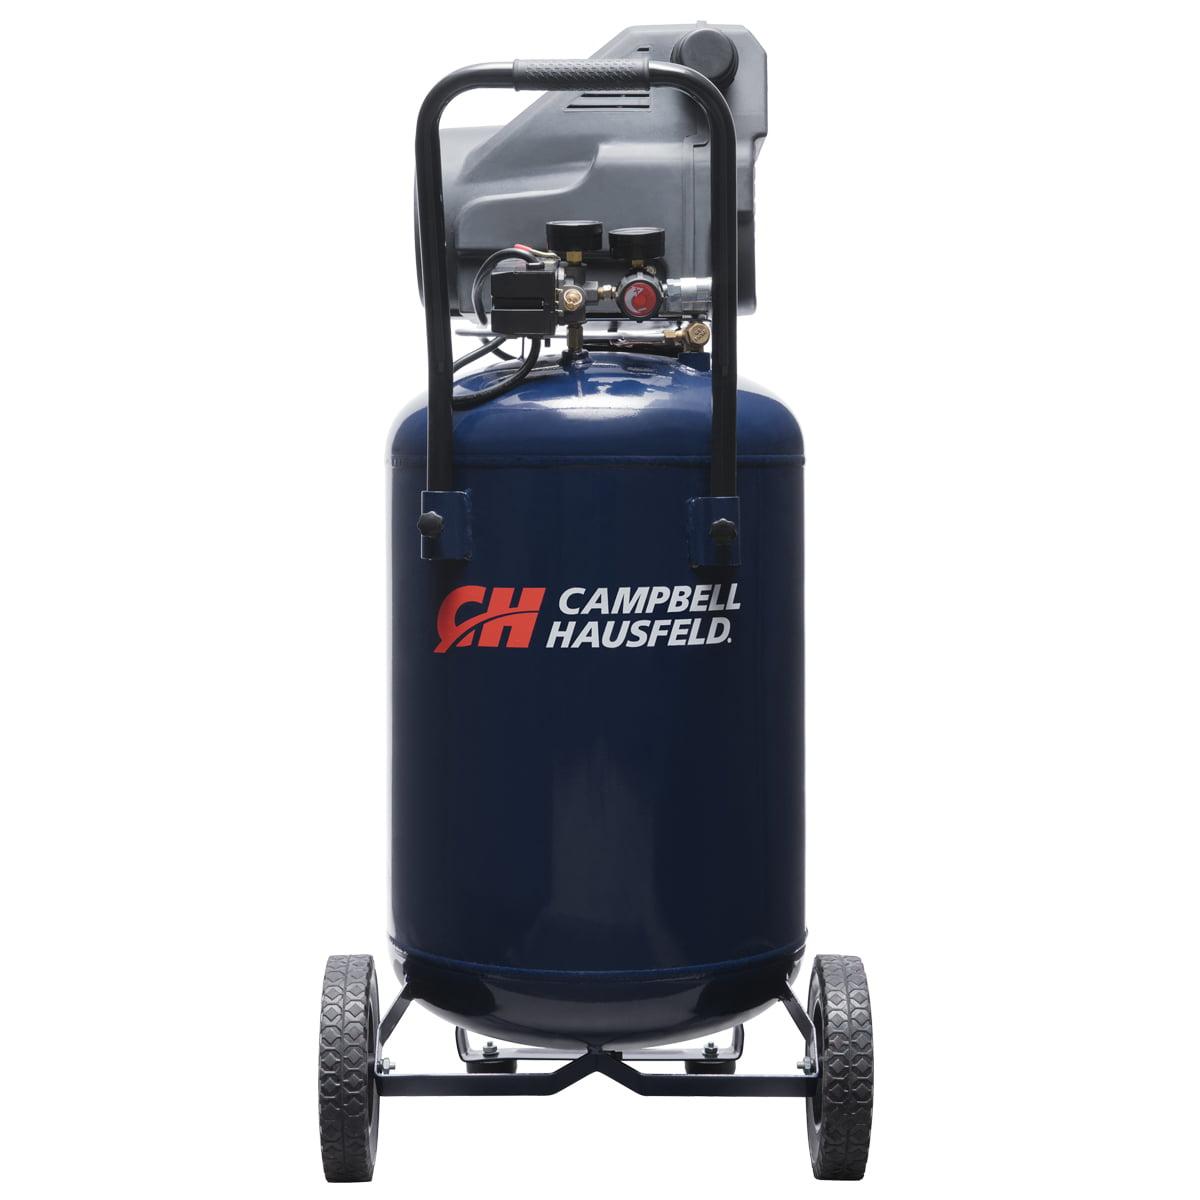 Campbell Hausfeld DC200100 20 Gallon Oil-Free Air Compressor